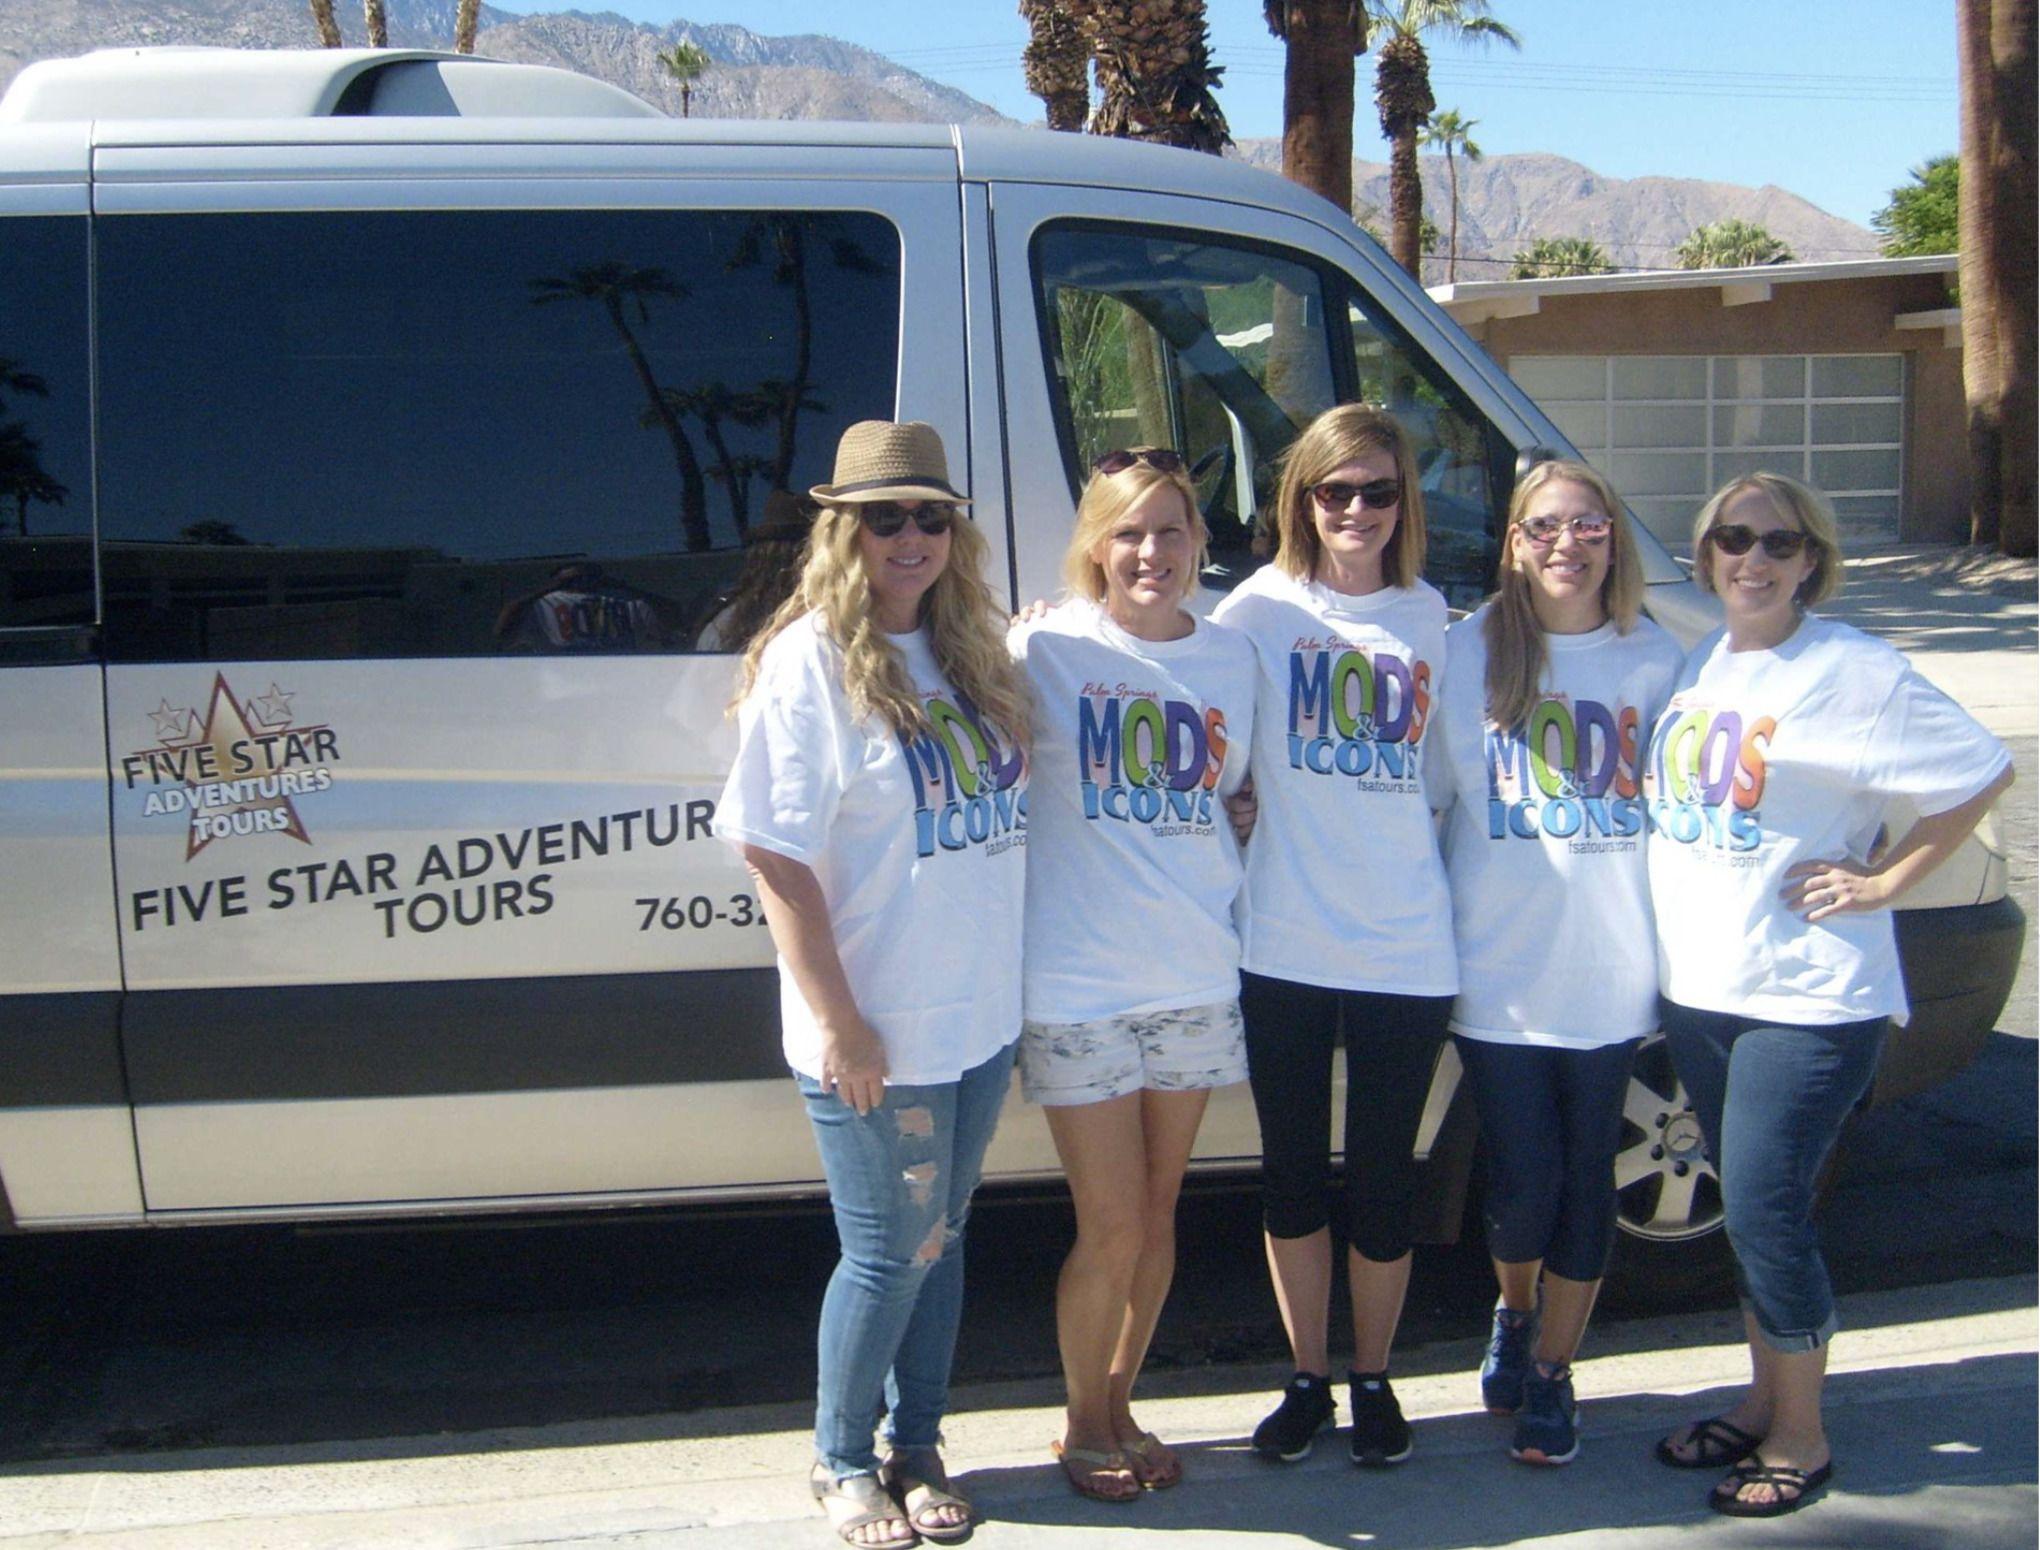 MODS & ICONS TOUR